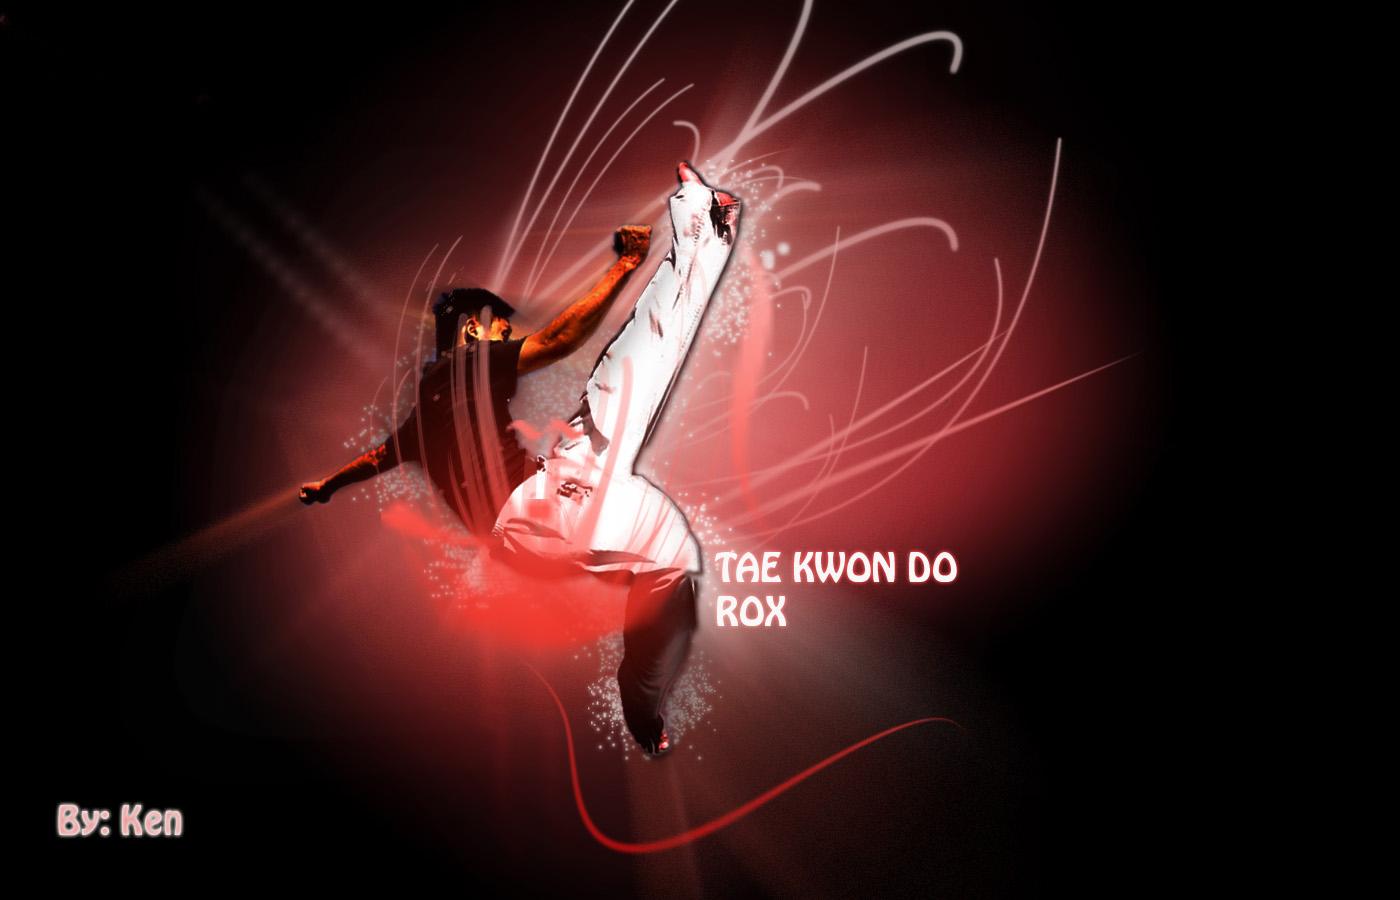 http://1.bp.blogspot.com/_PFvtkCHm_mM/TUljS4_S_qI/AAAAAAAAAe4/yBmulZ0_1xk/s1600/Taekwondo_Rox_by_pepe12crt.jpg